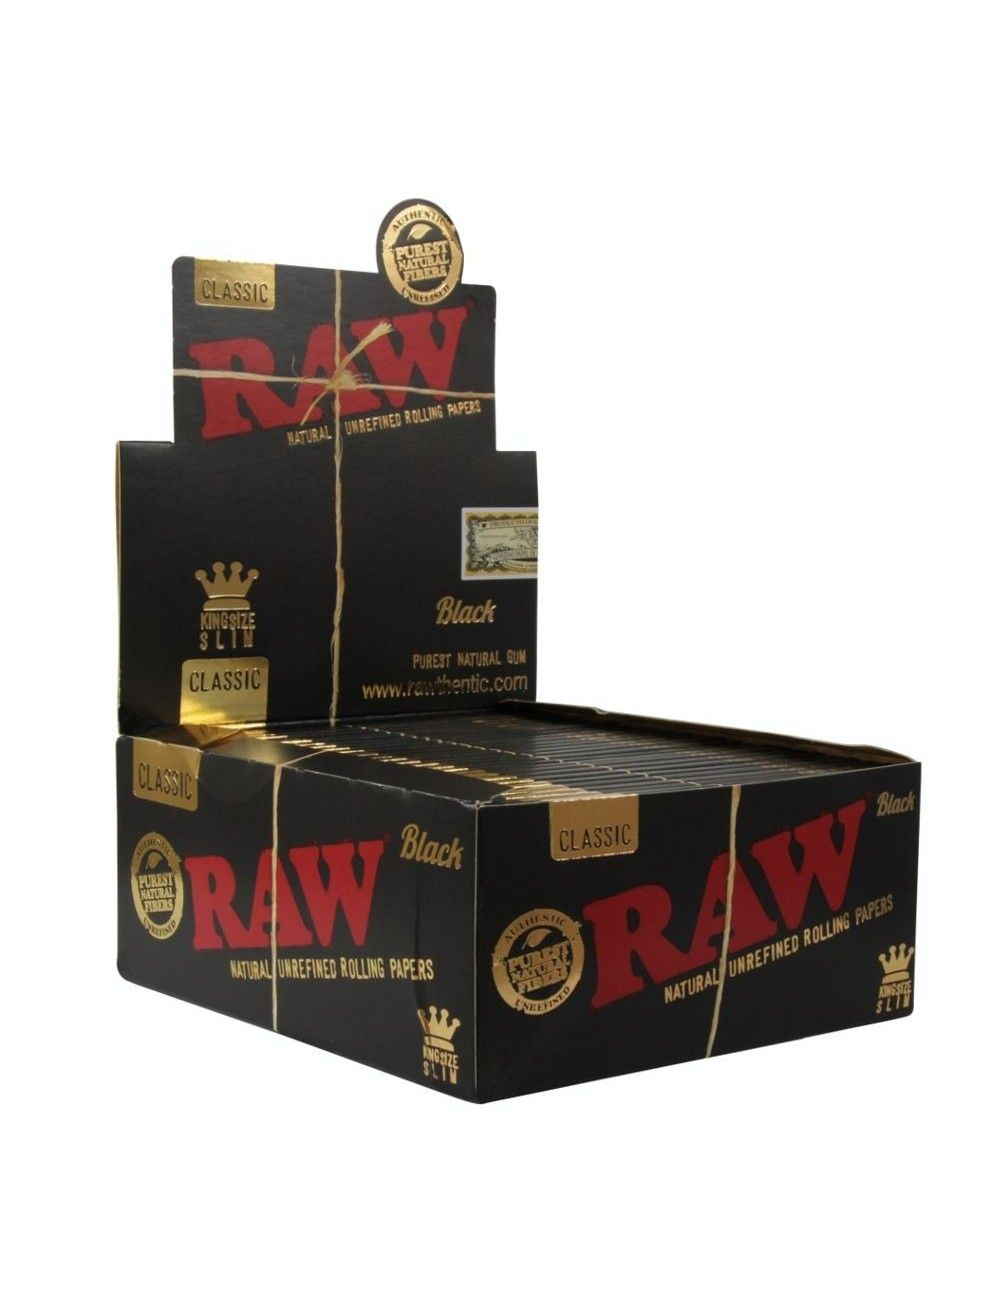 Raw Black King Size Slim Europe Edition